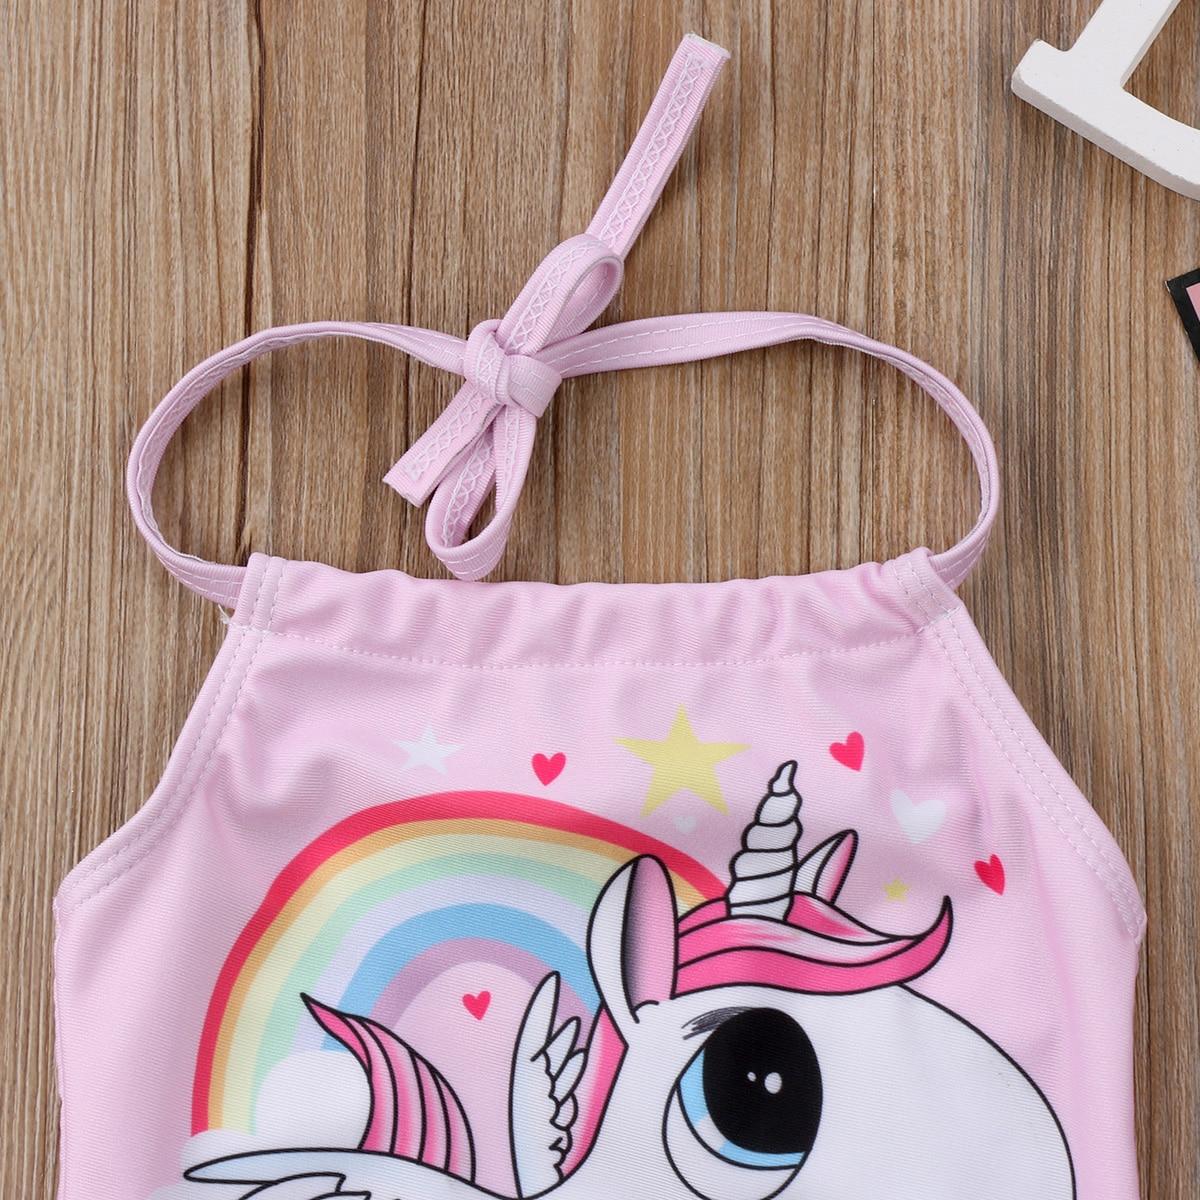 Kid Baby Girls Unicorn Bikini Swimwear Cute Summer Backless bathing Suit Swimsuit Bathing Suit Beachwear One Piece